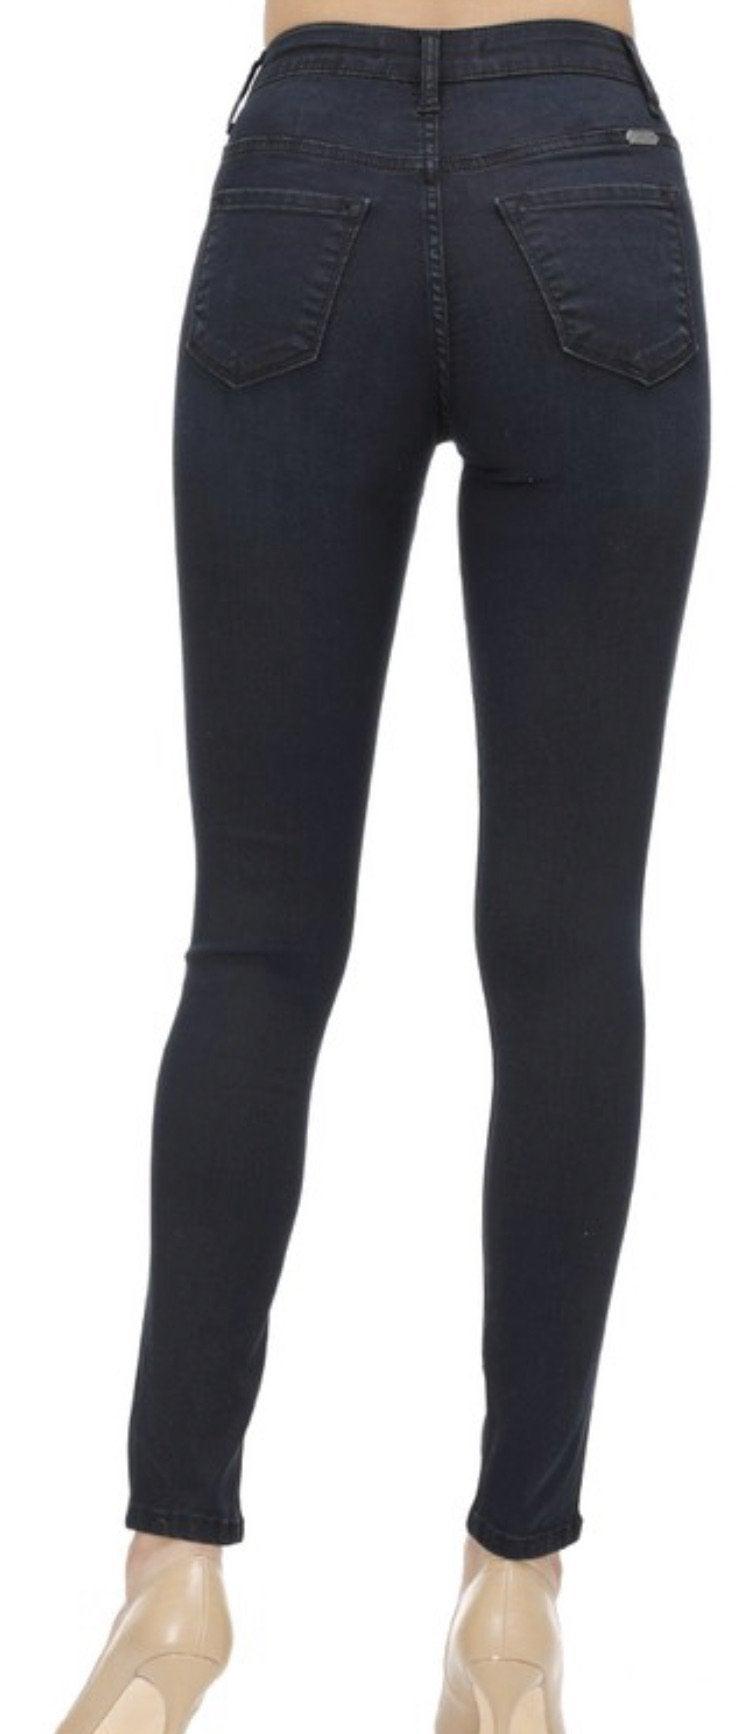 Charcoal Black Denim Skinnies by Kan Can